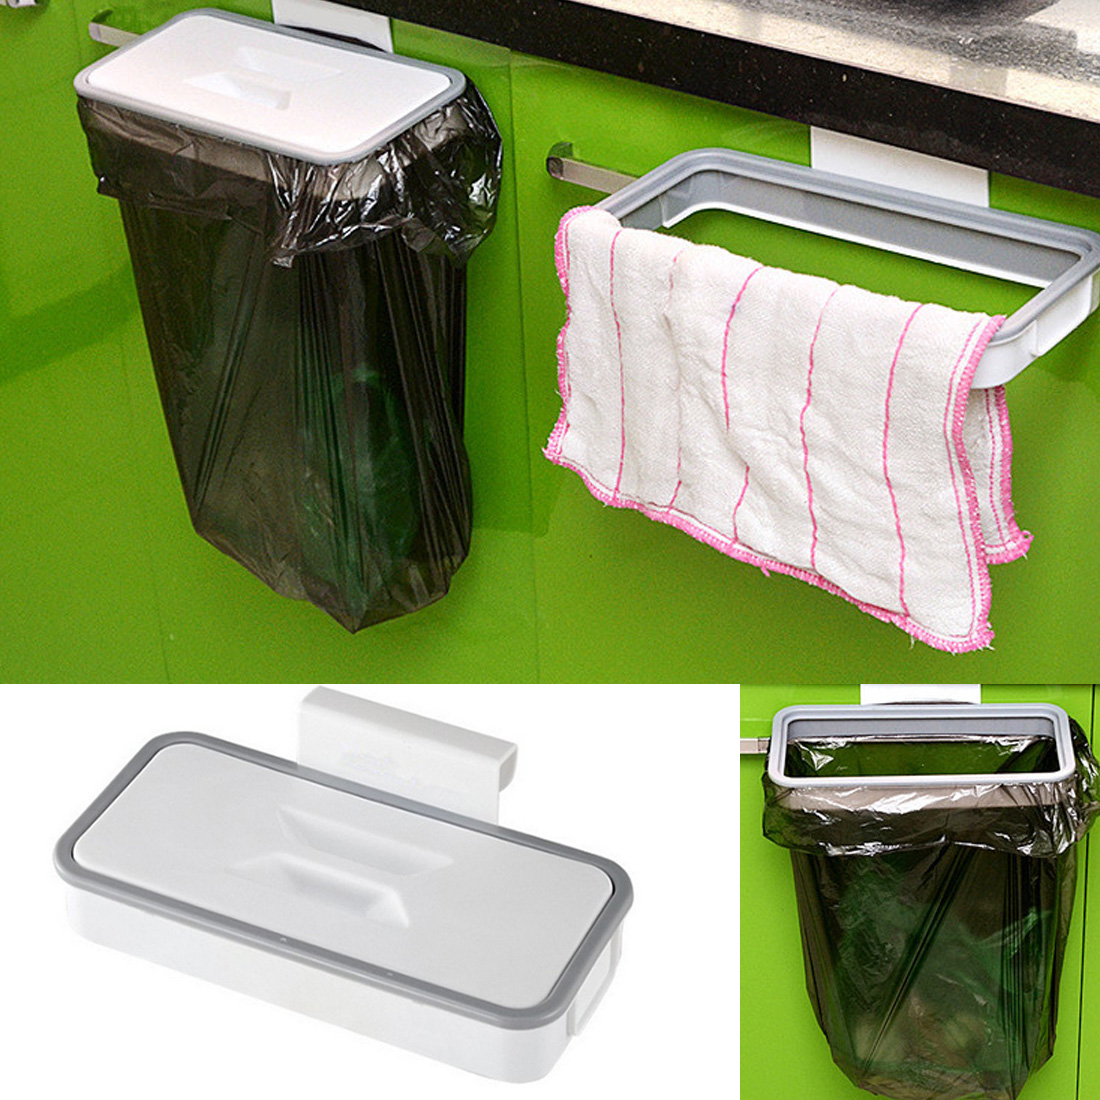 Household Kitchen Cabinet Door Basket Hanging Trash Can Waste Bin Garbage Rack Tool